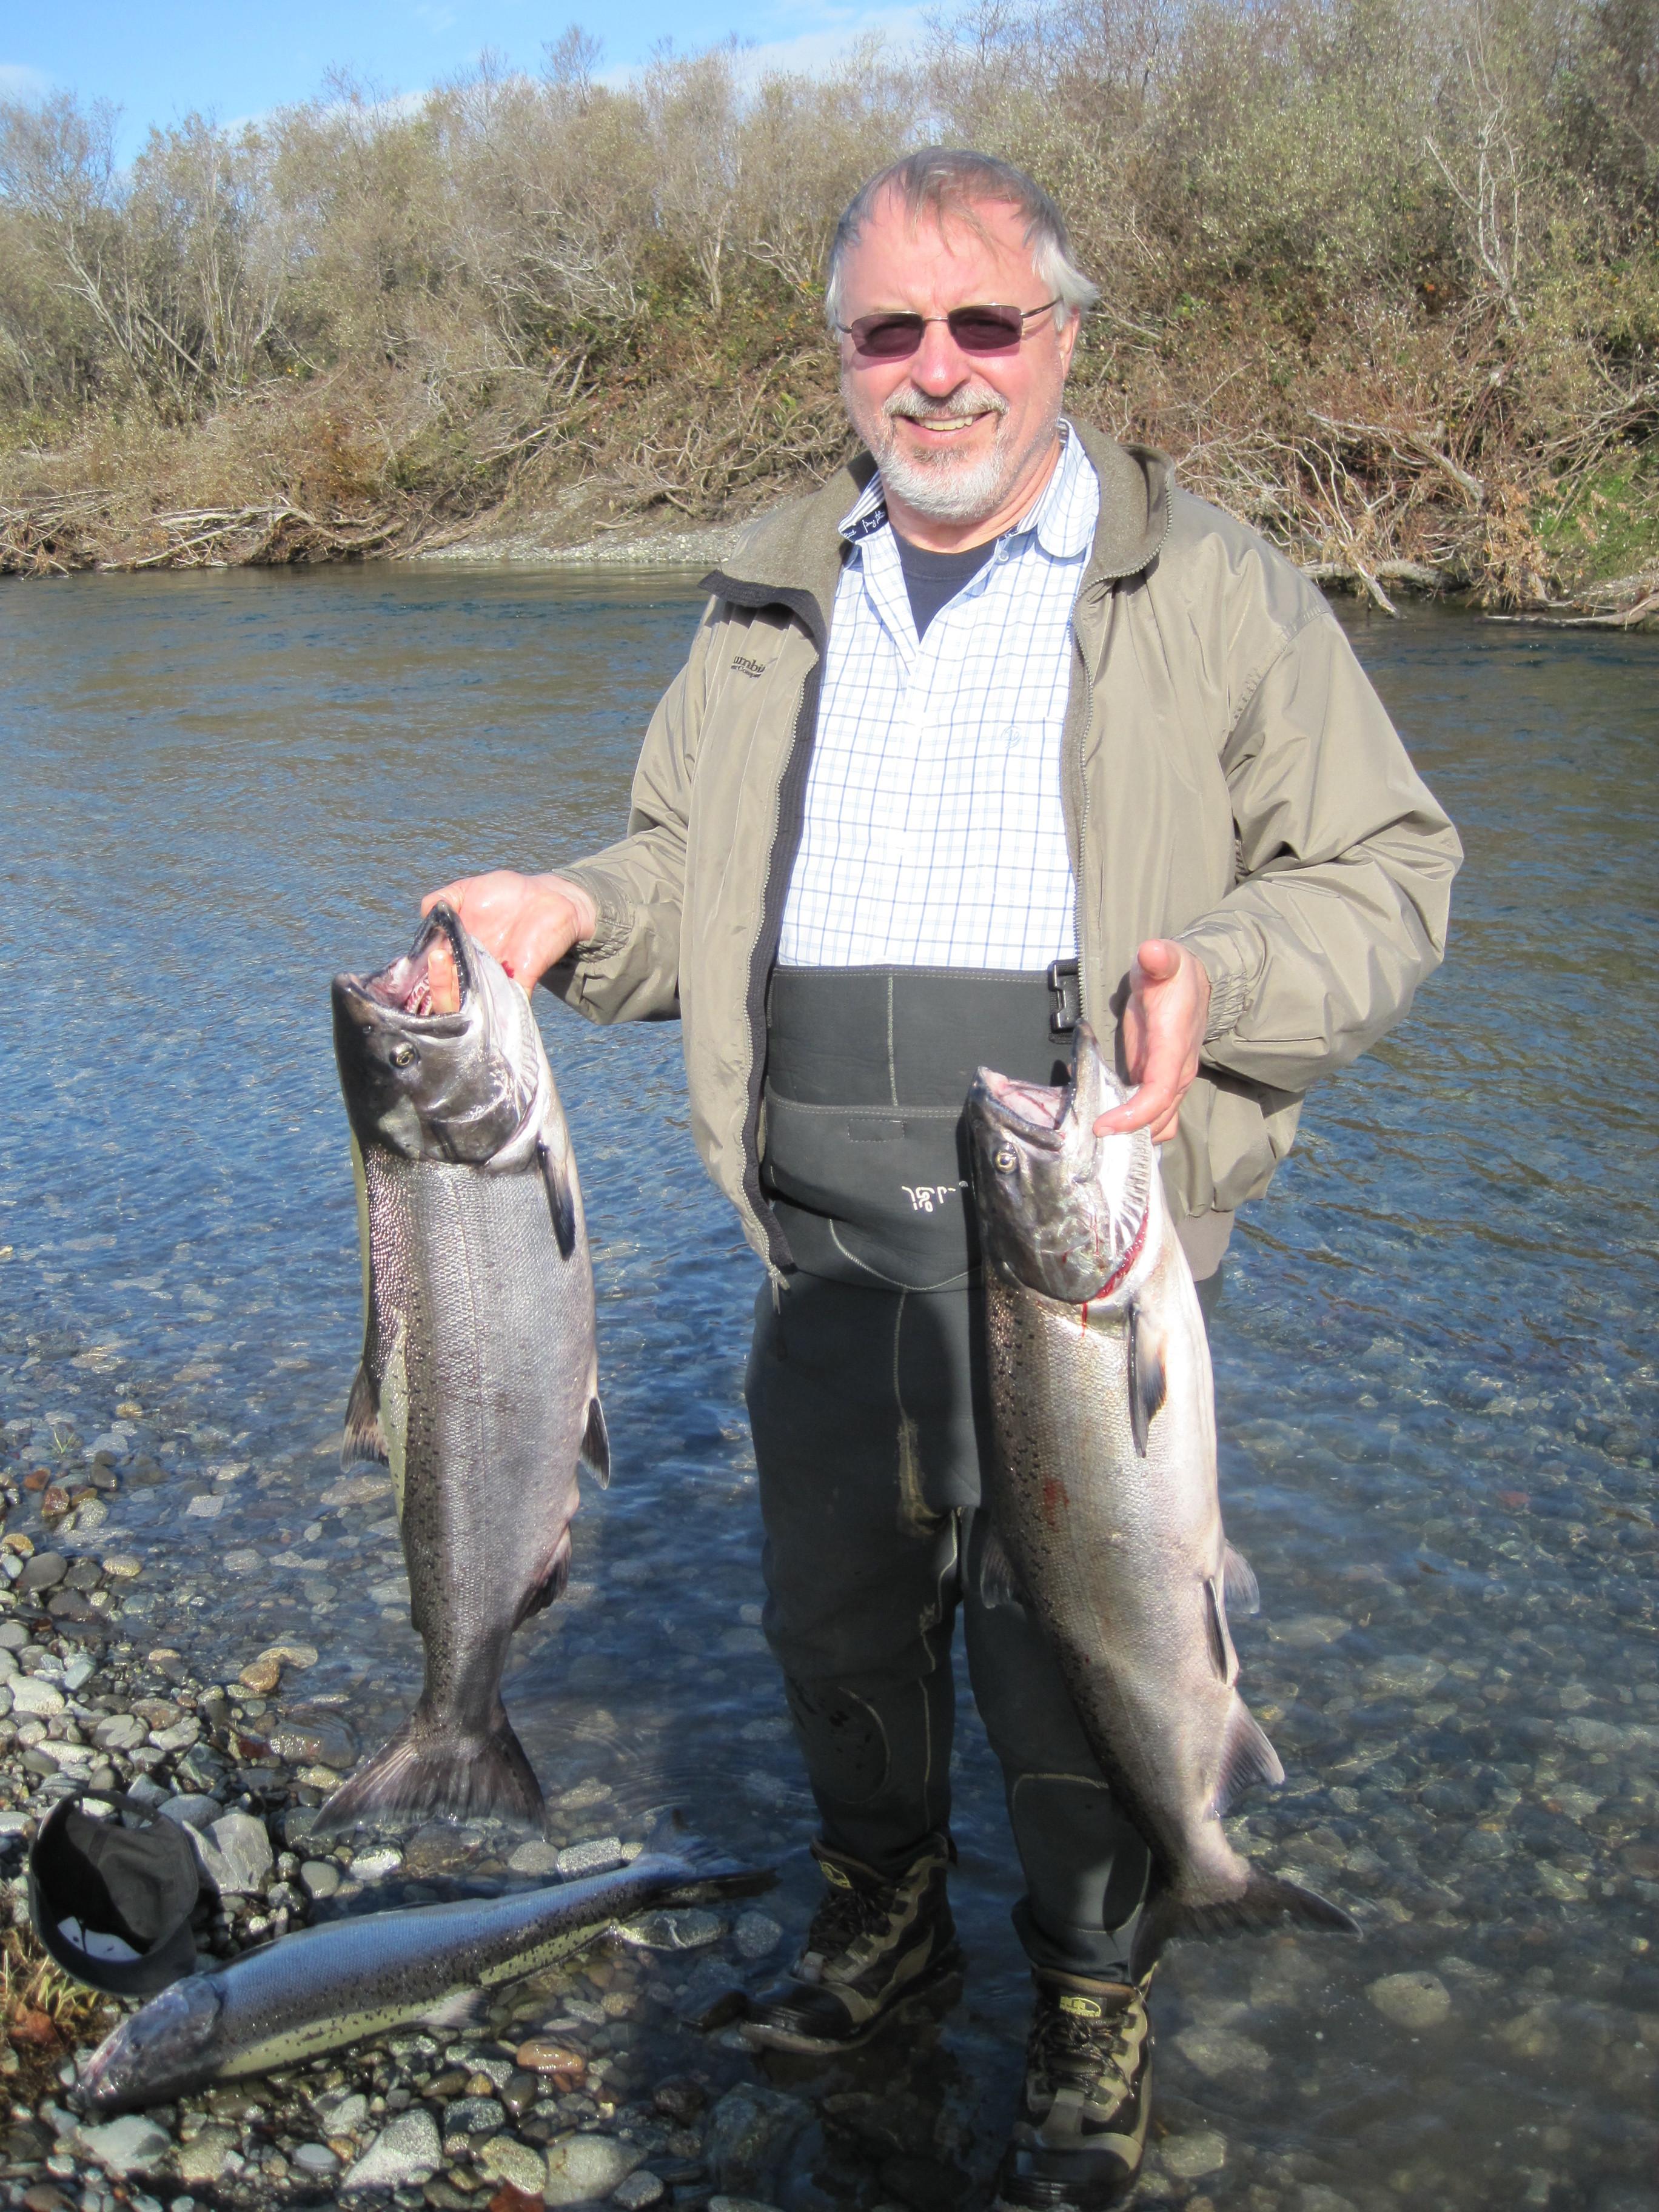 Roaring Fork Guide Service: Driftboat Fishing Trips